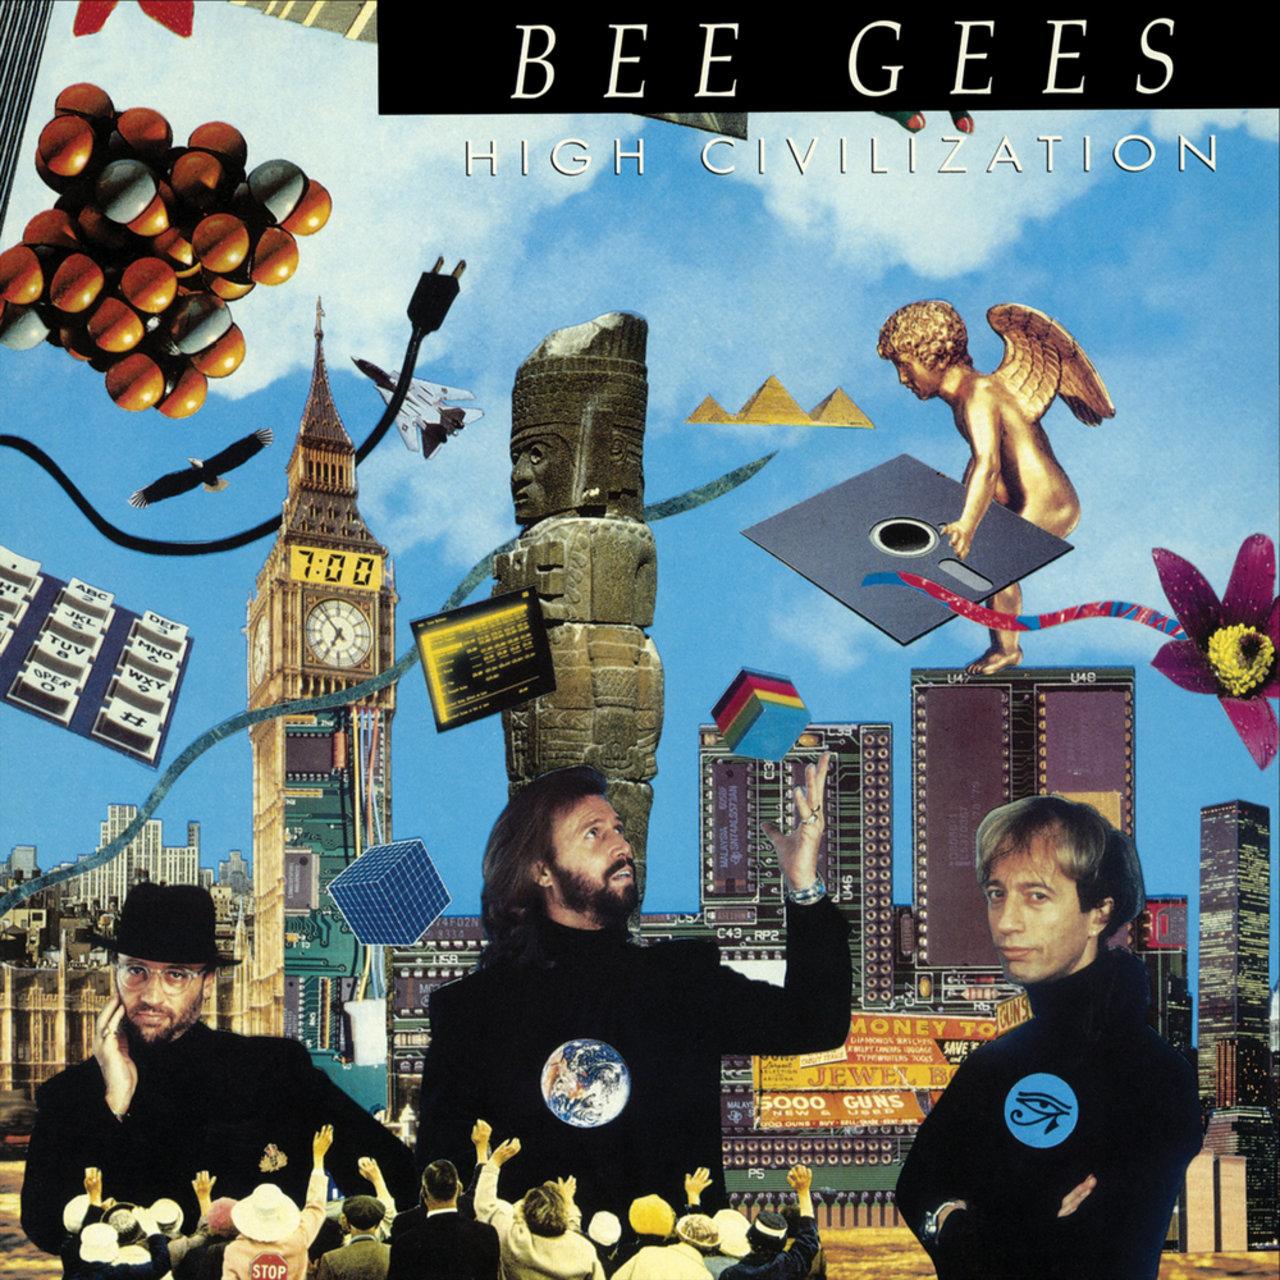 Bee Gees - High Civilization (Warner Bros., 1991). Cover art by Lou Beach.